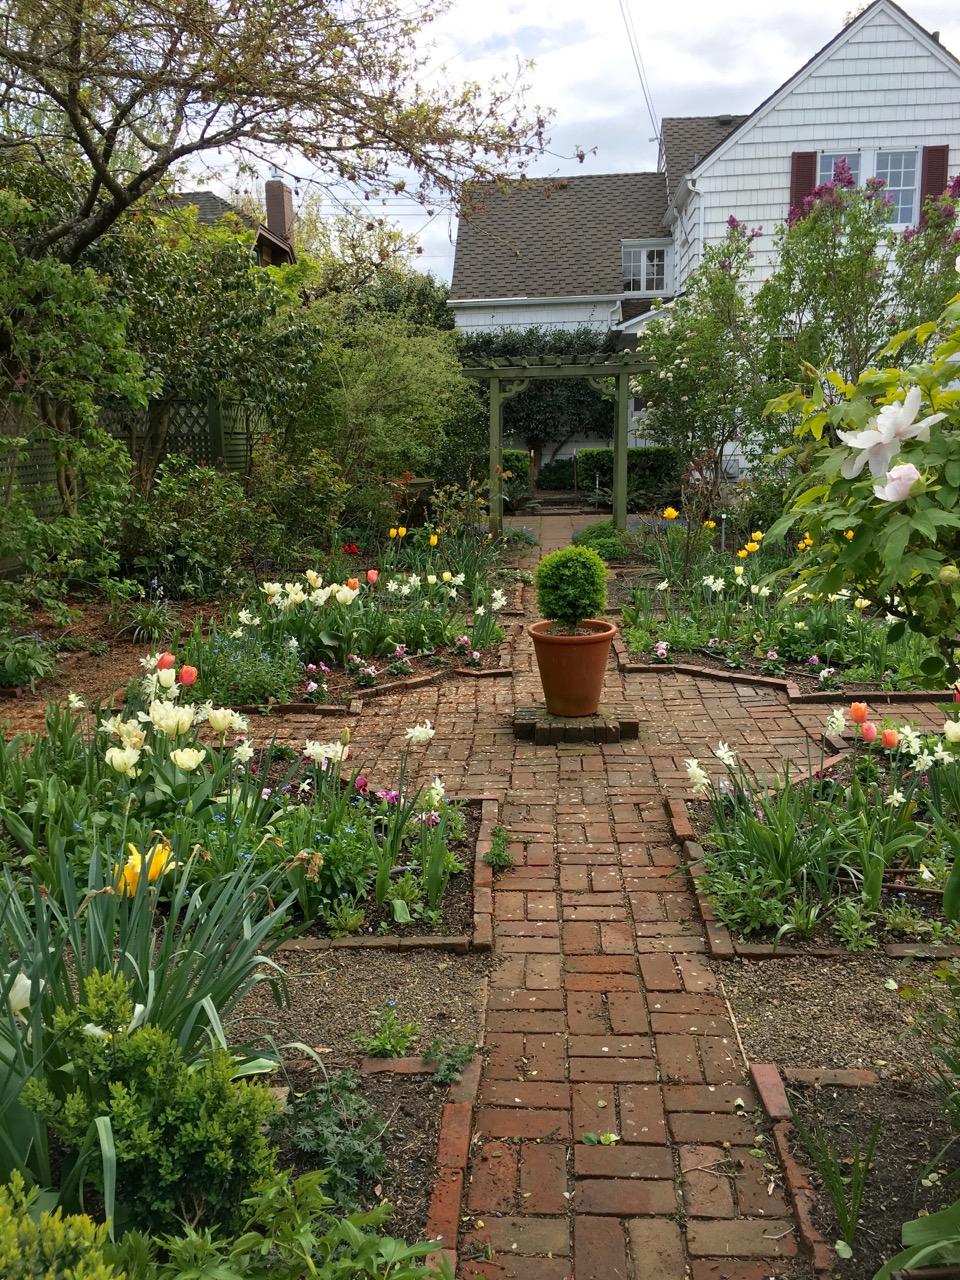 Open Garden!   Lord & Schryver Conservancy blog